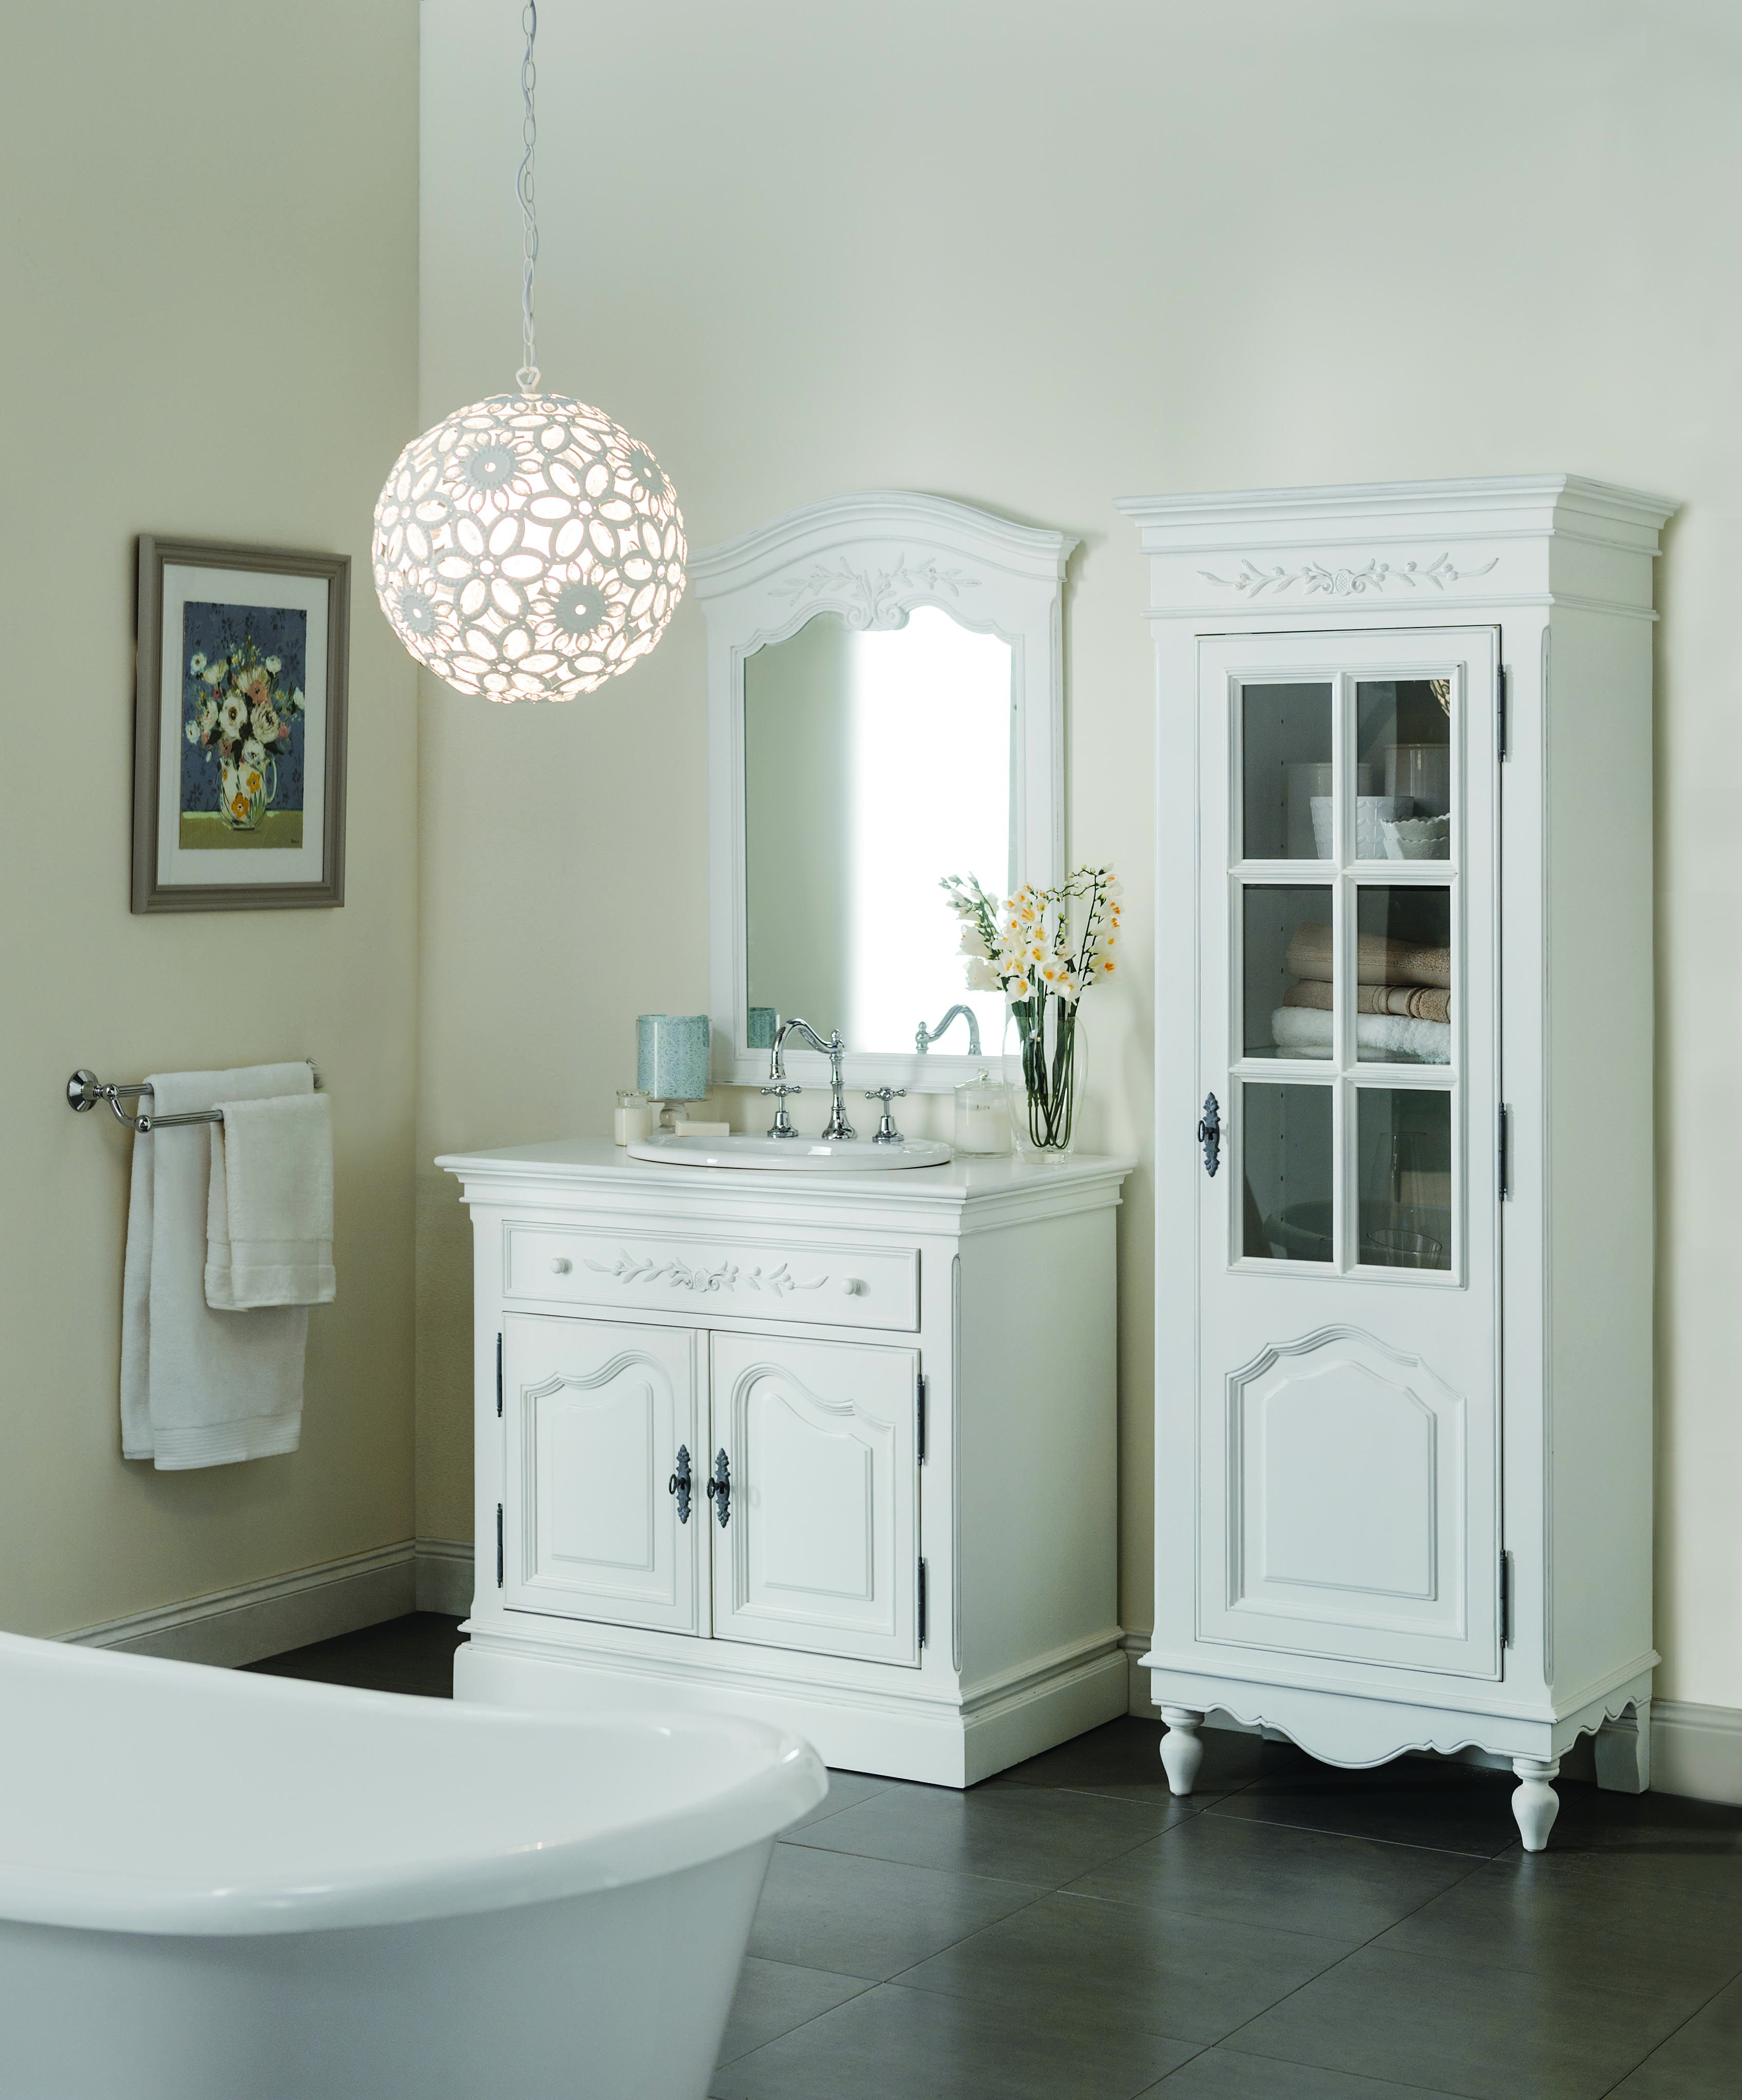 Romance Single Vanity Package Www Earlysettler Com Au Bathroom Freestanding Bathroom Baskets Stylish Furniture